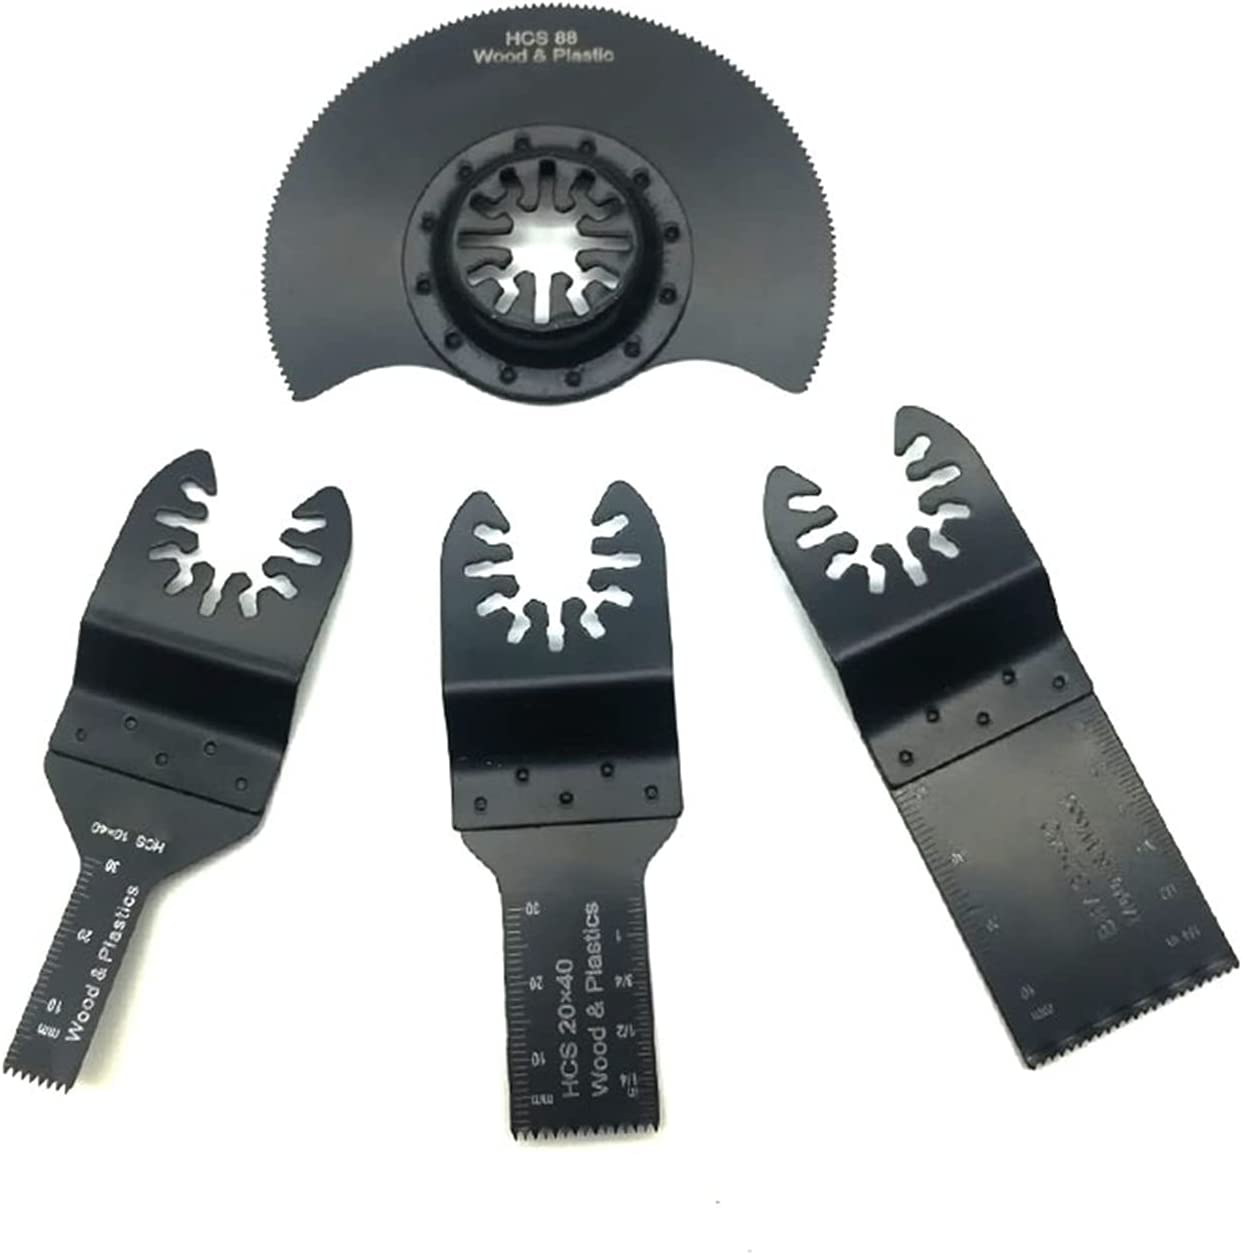 KESHIKUI New MEI 4pcs Set List price Saw Accessories Multi-Function Detroit Mall O Blade